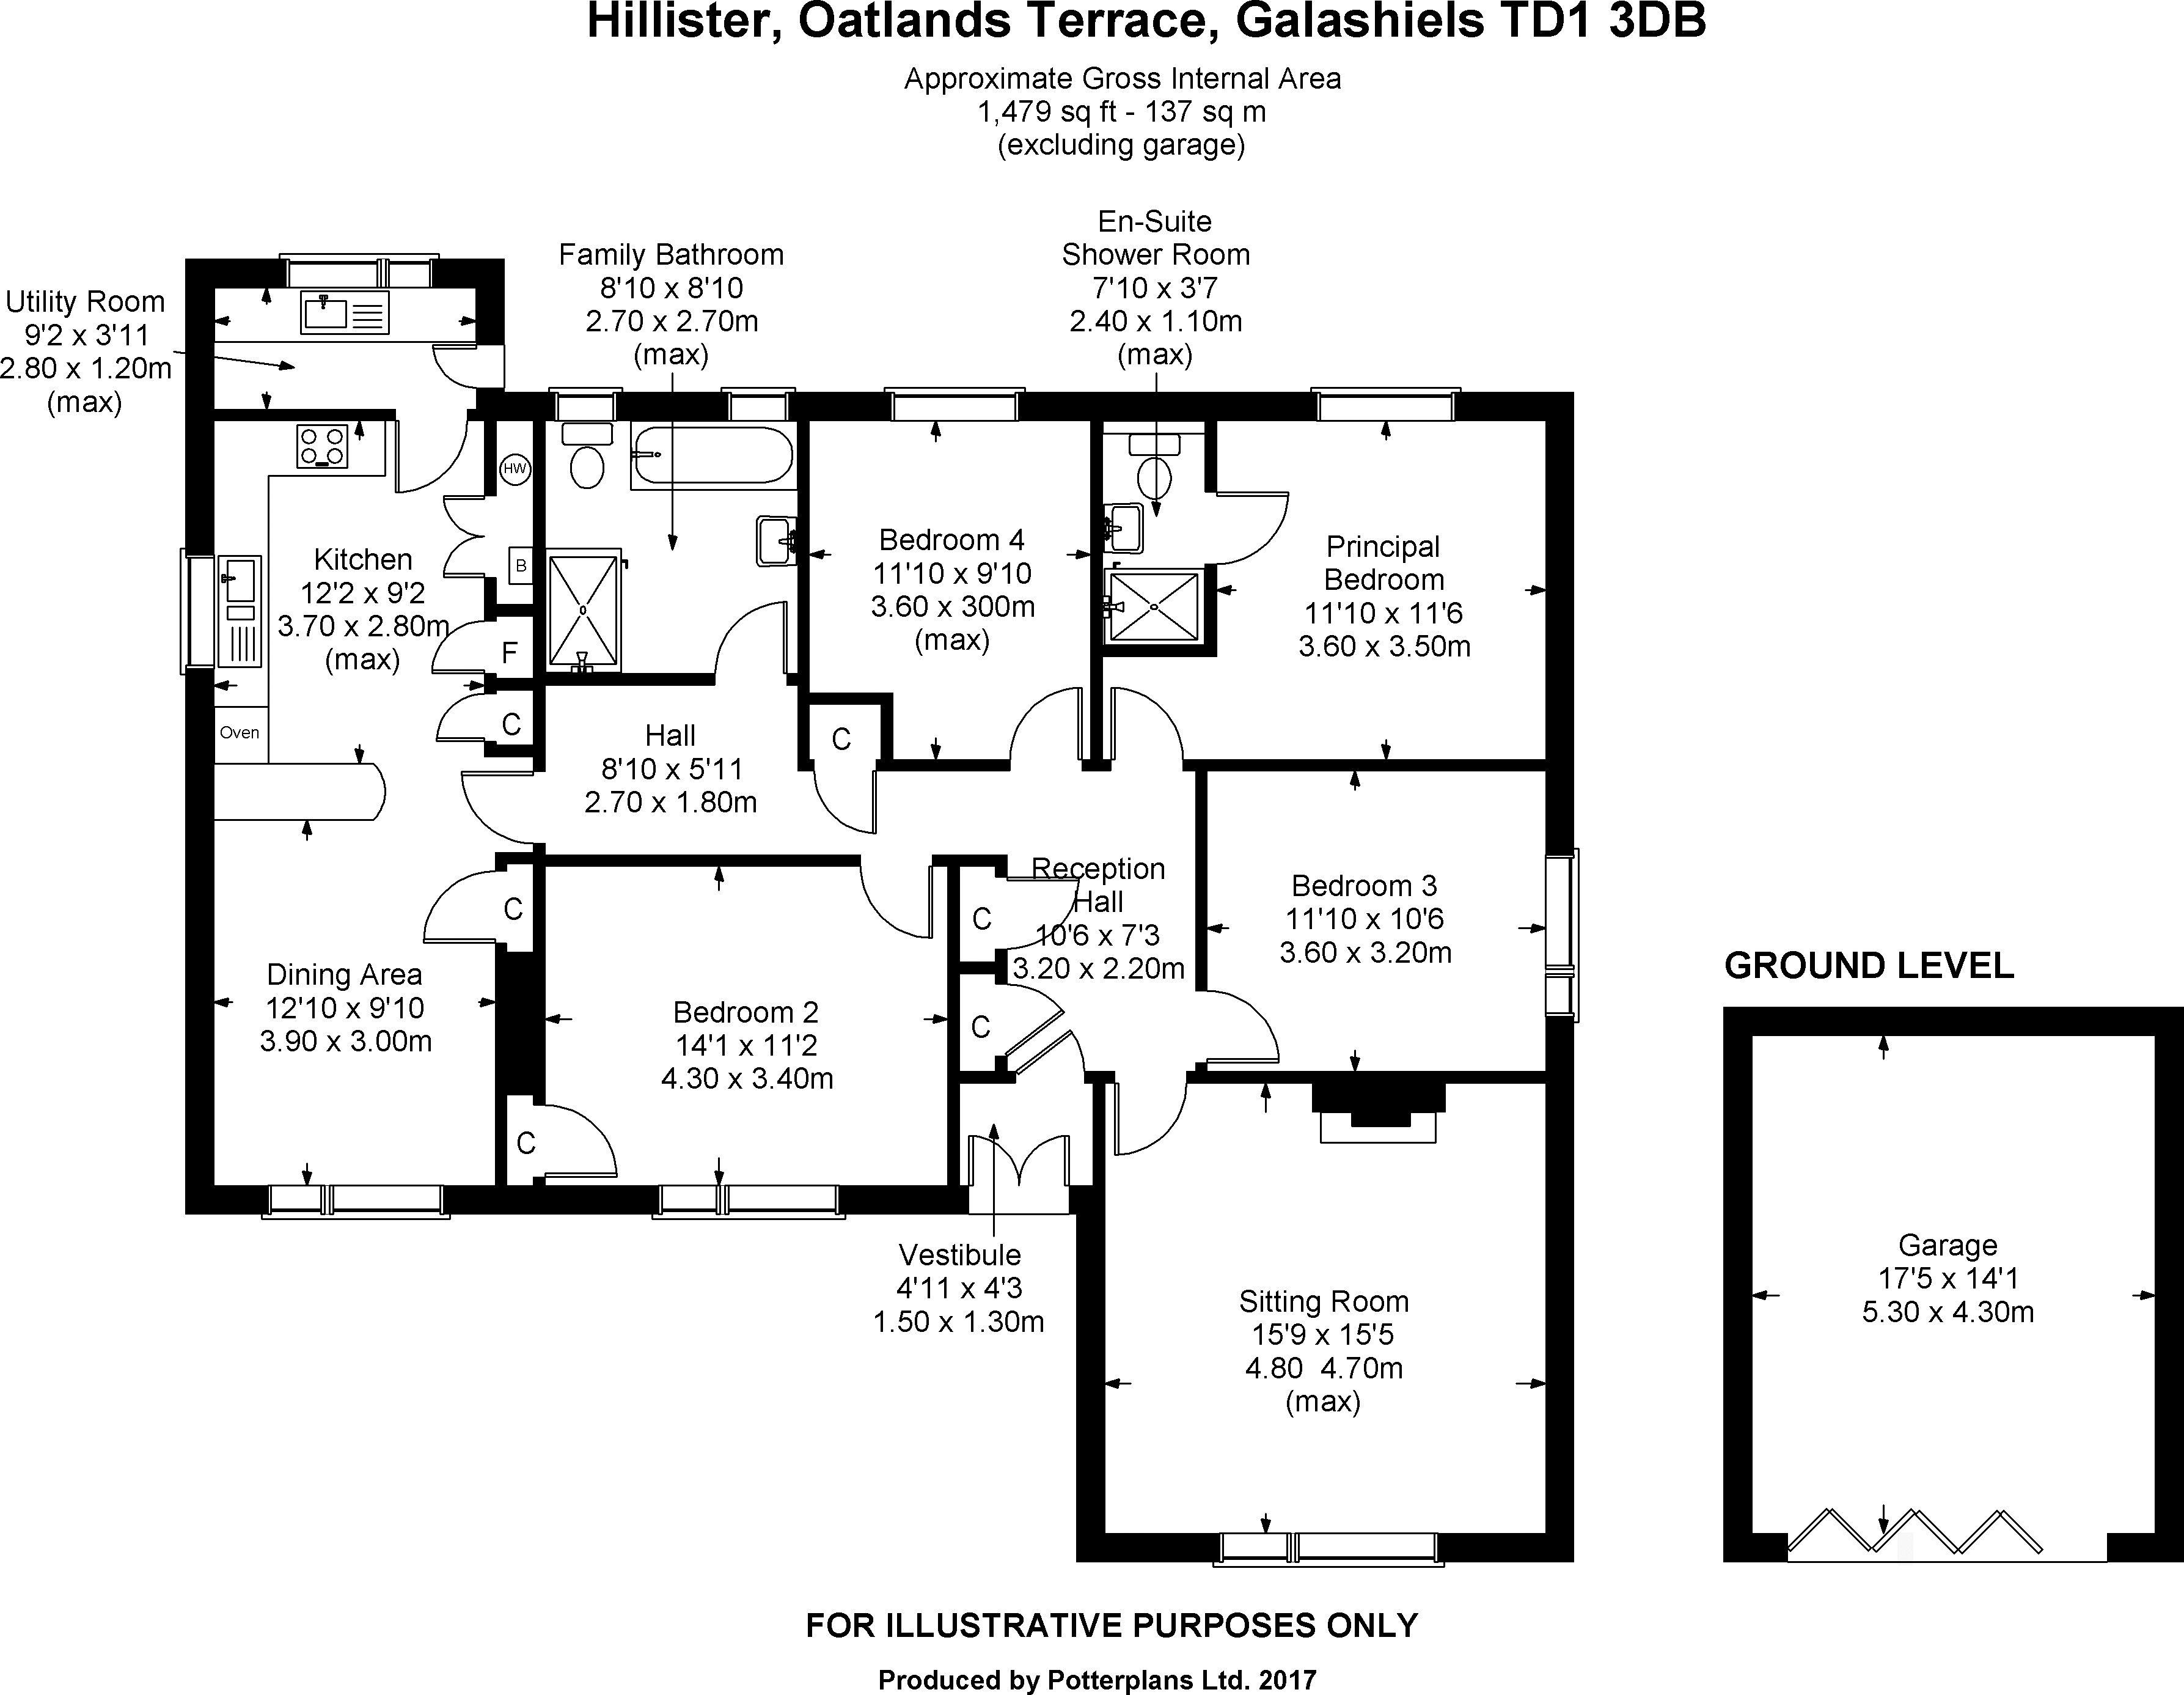 Hillister Floorplan